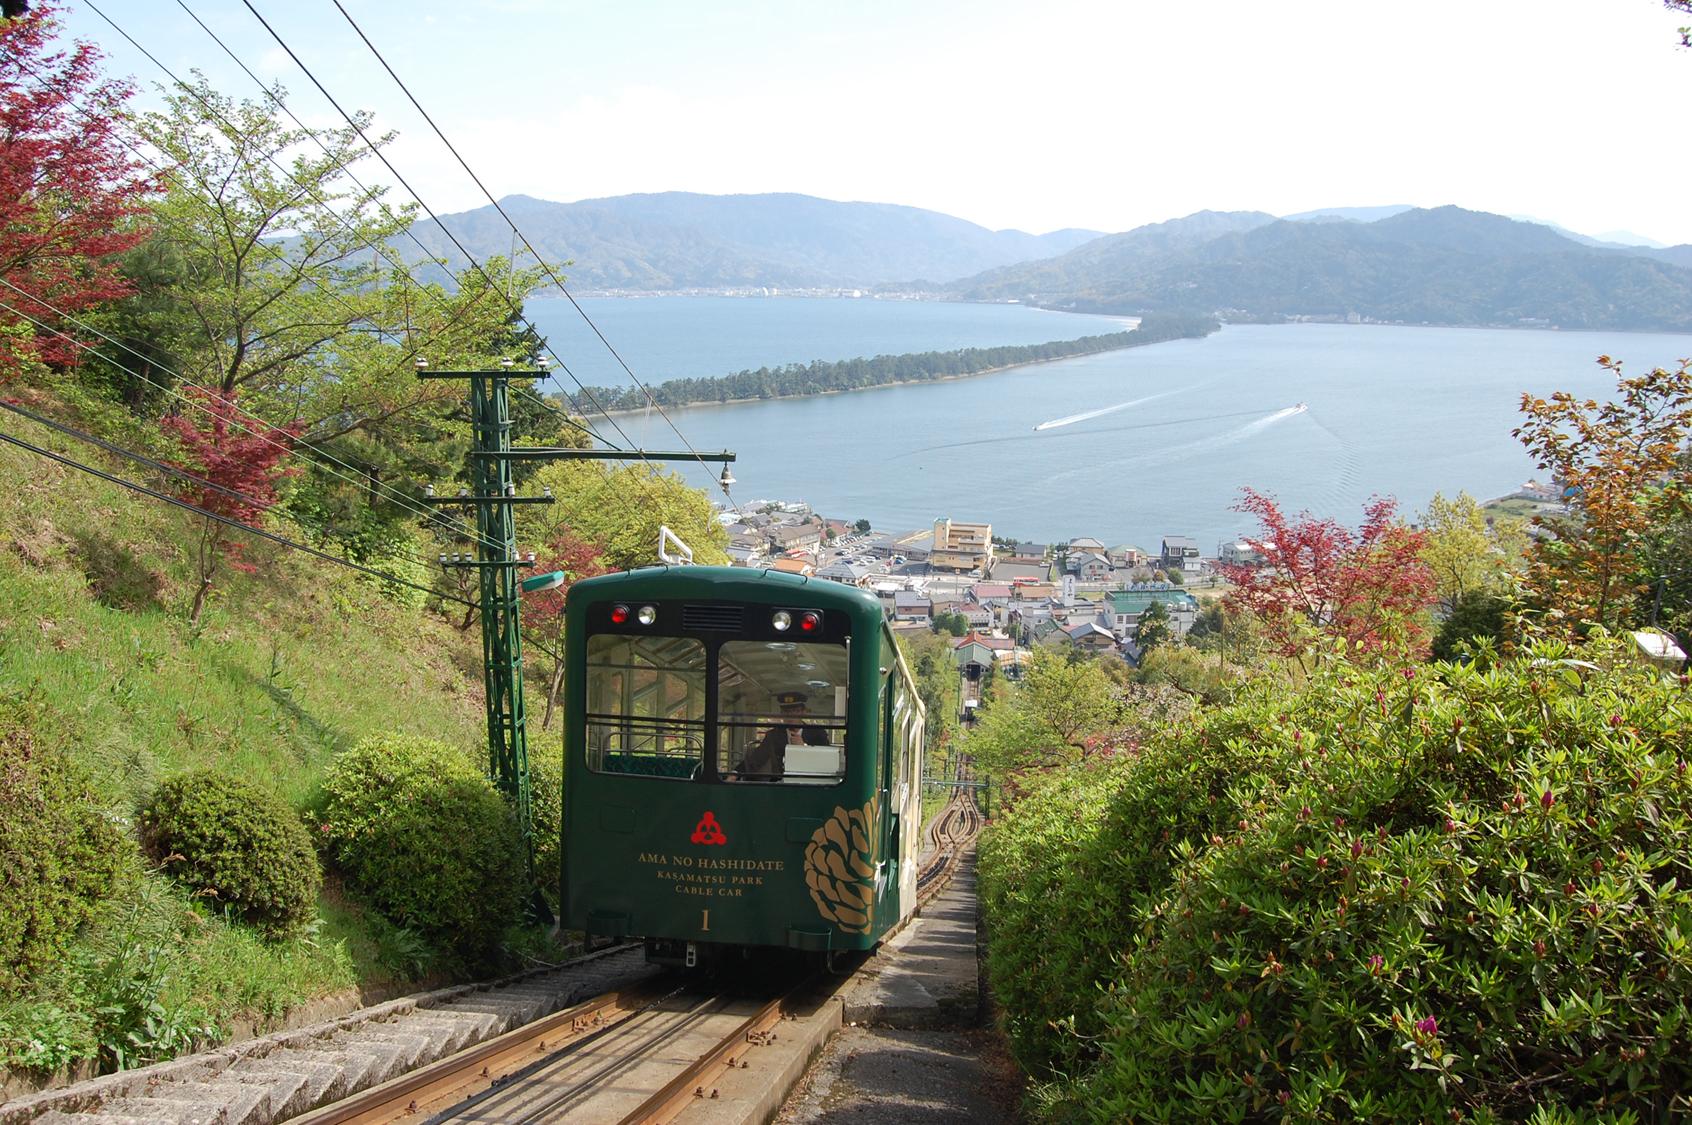 Amanohashidate-kasamatsu Park Cable car